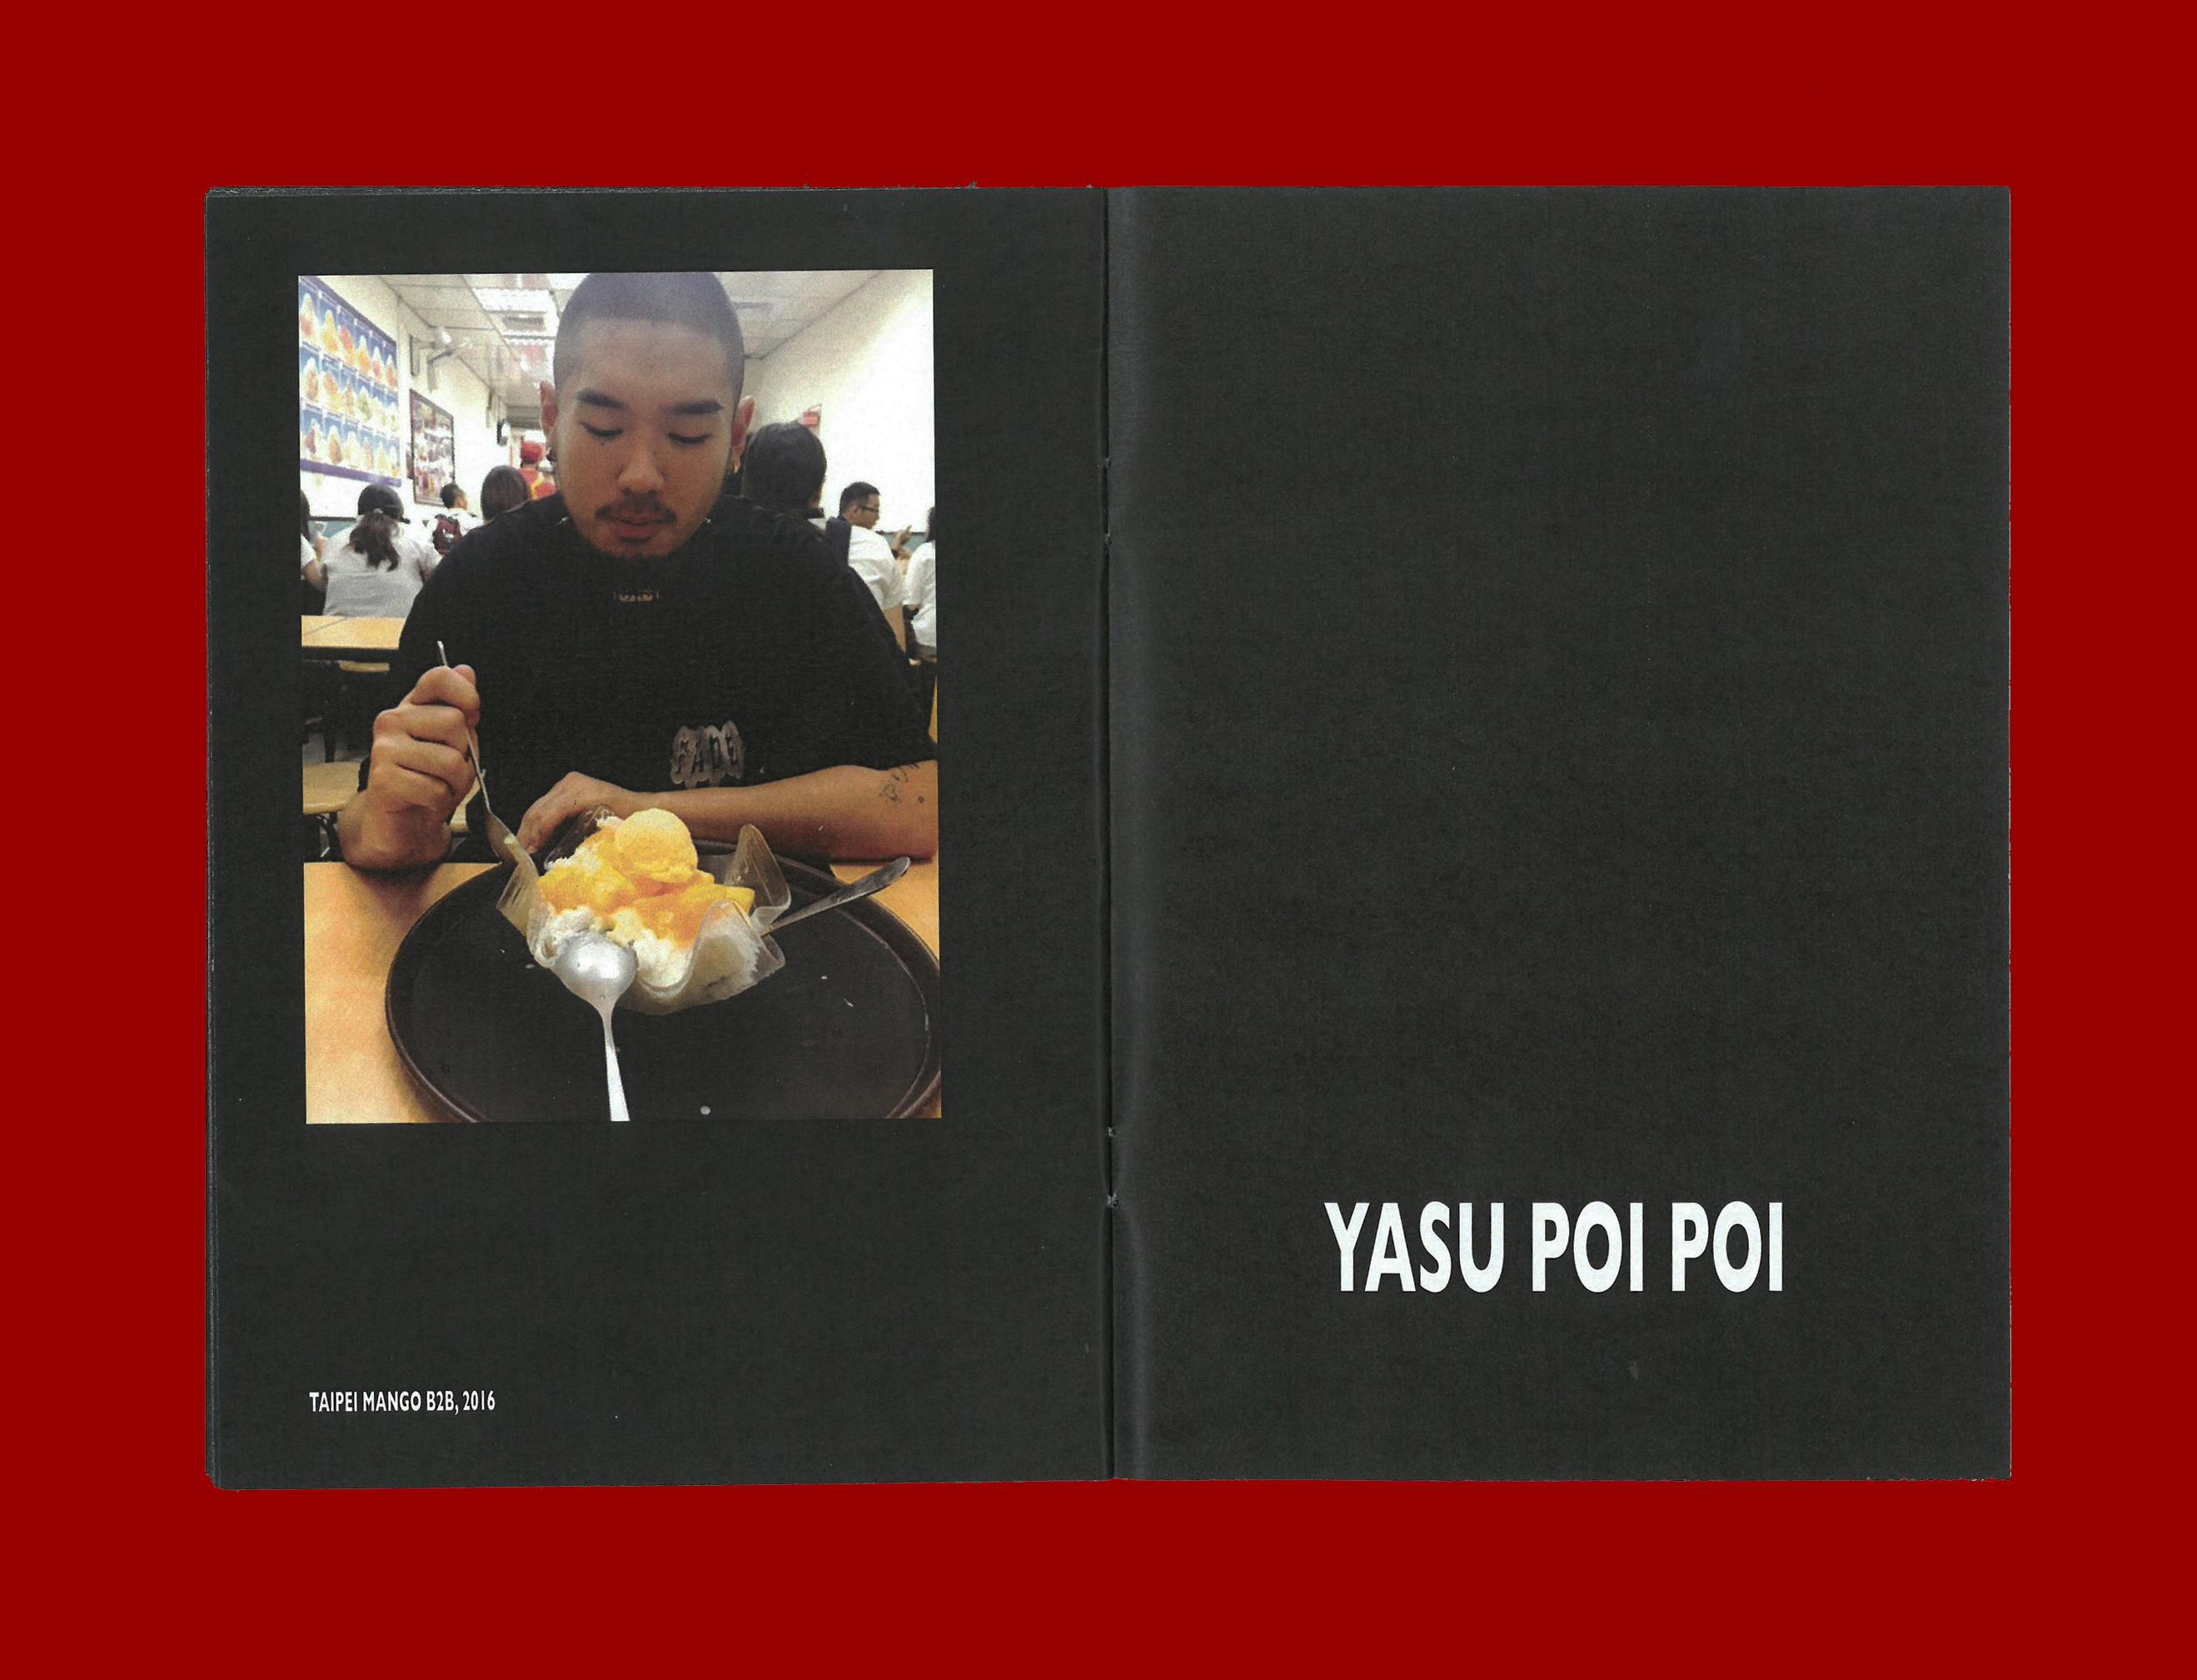 Printed Matter by Ron Wan. Fanzine: Desserttime, featuring Taipei Mango B2B, 2016 by Yasu Poi Poi